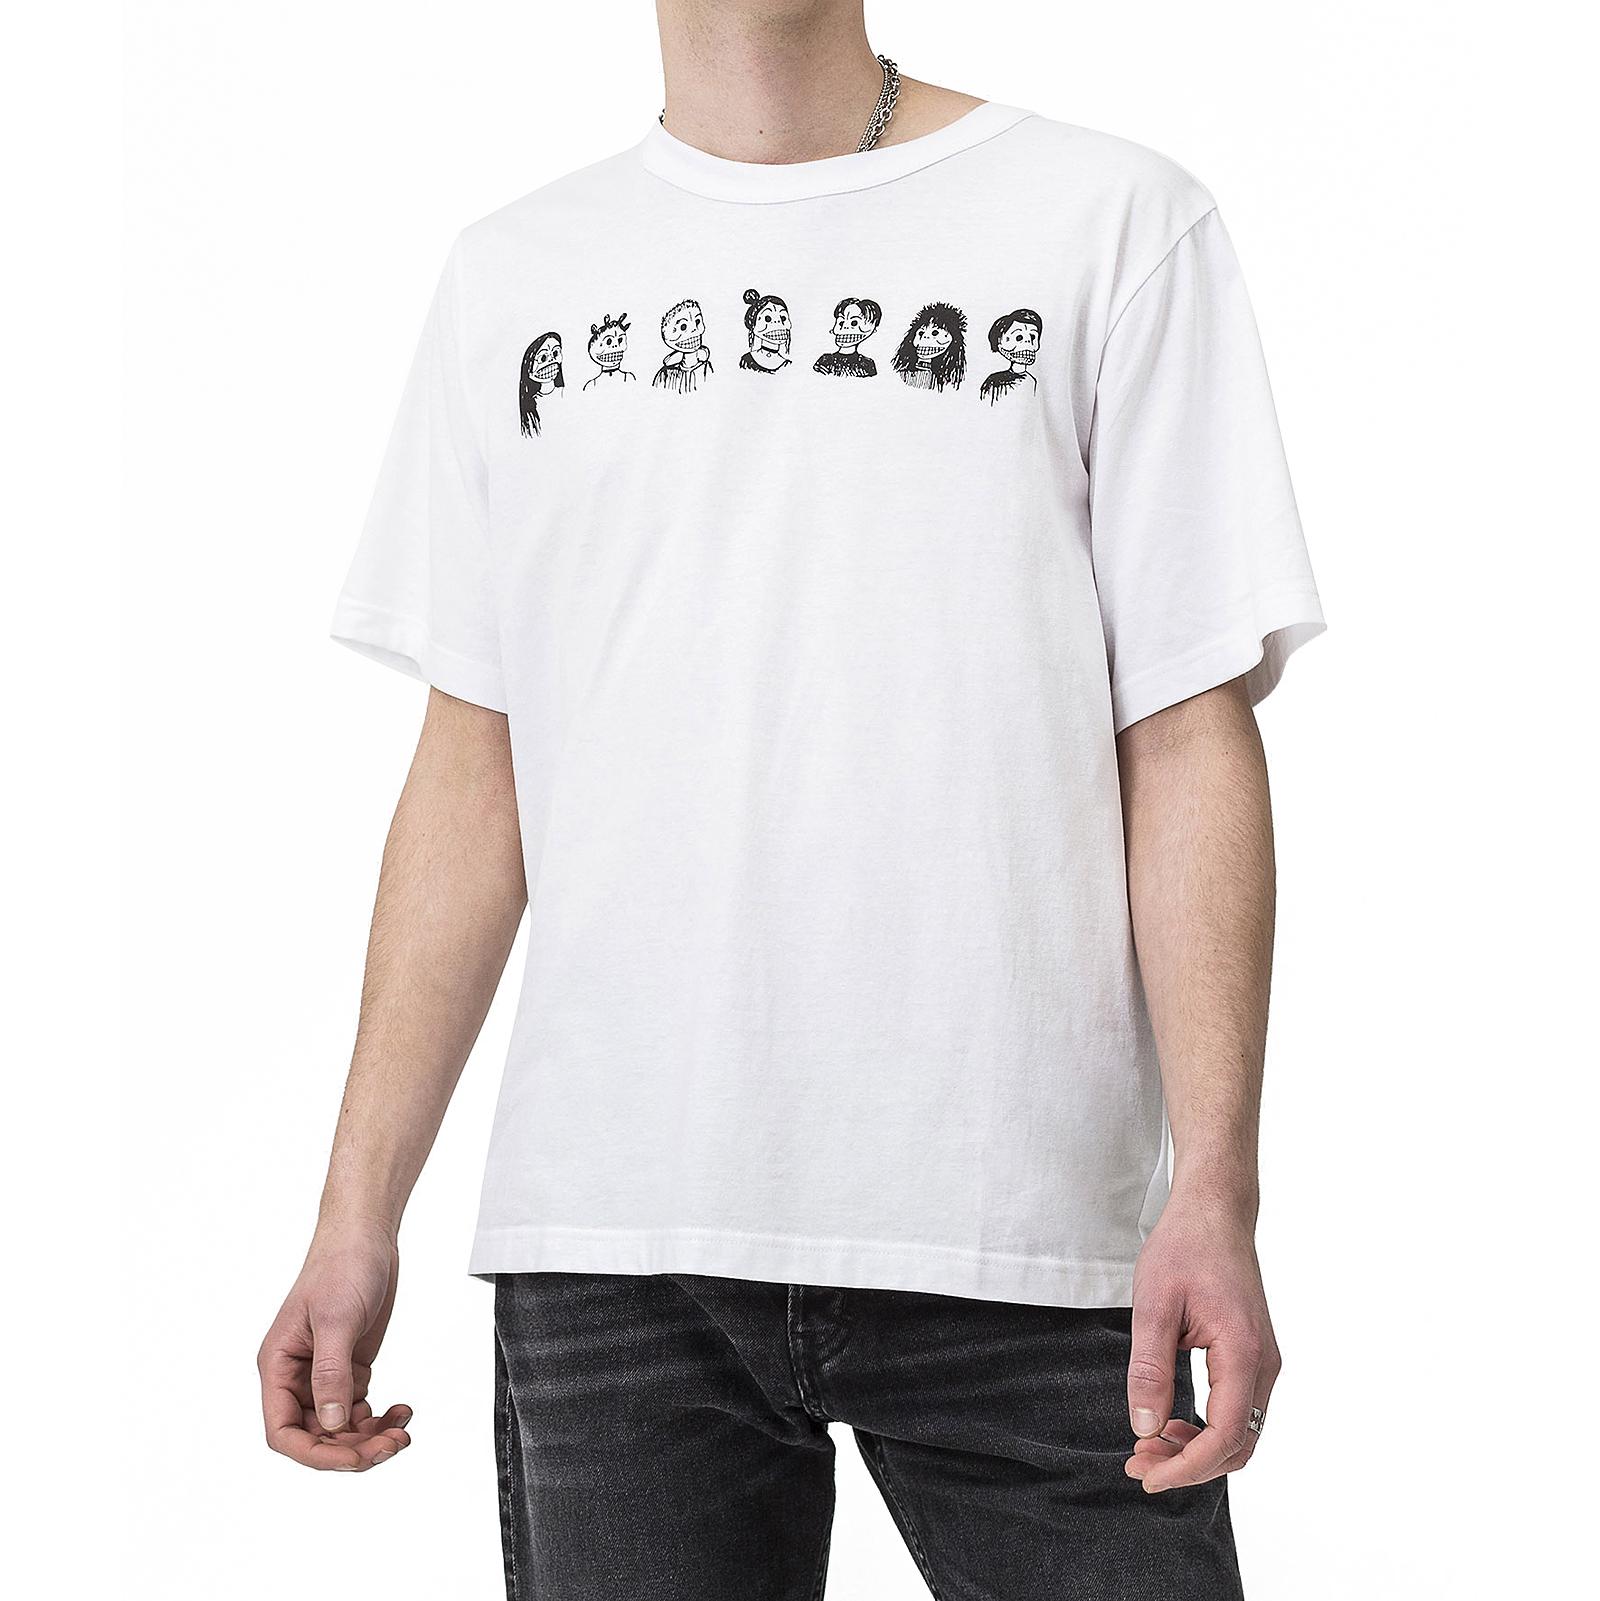 601944e299dcb Cheap Monday T-Shirt Boxer College White White Tee Squad ngtrke1816 ...